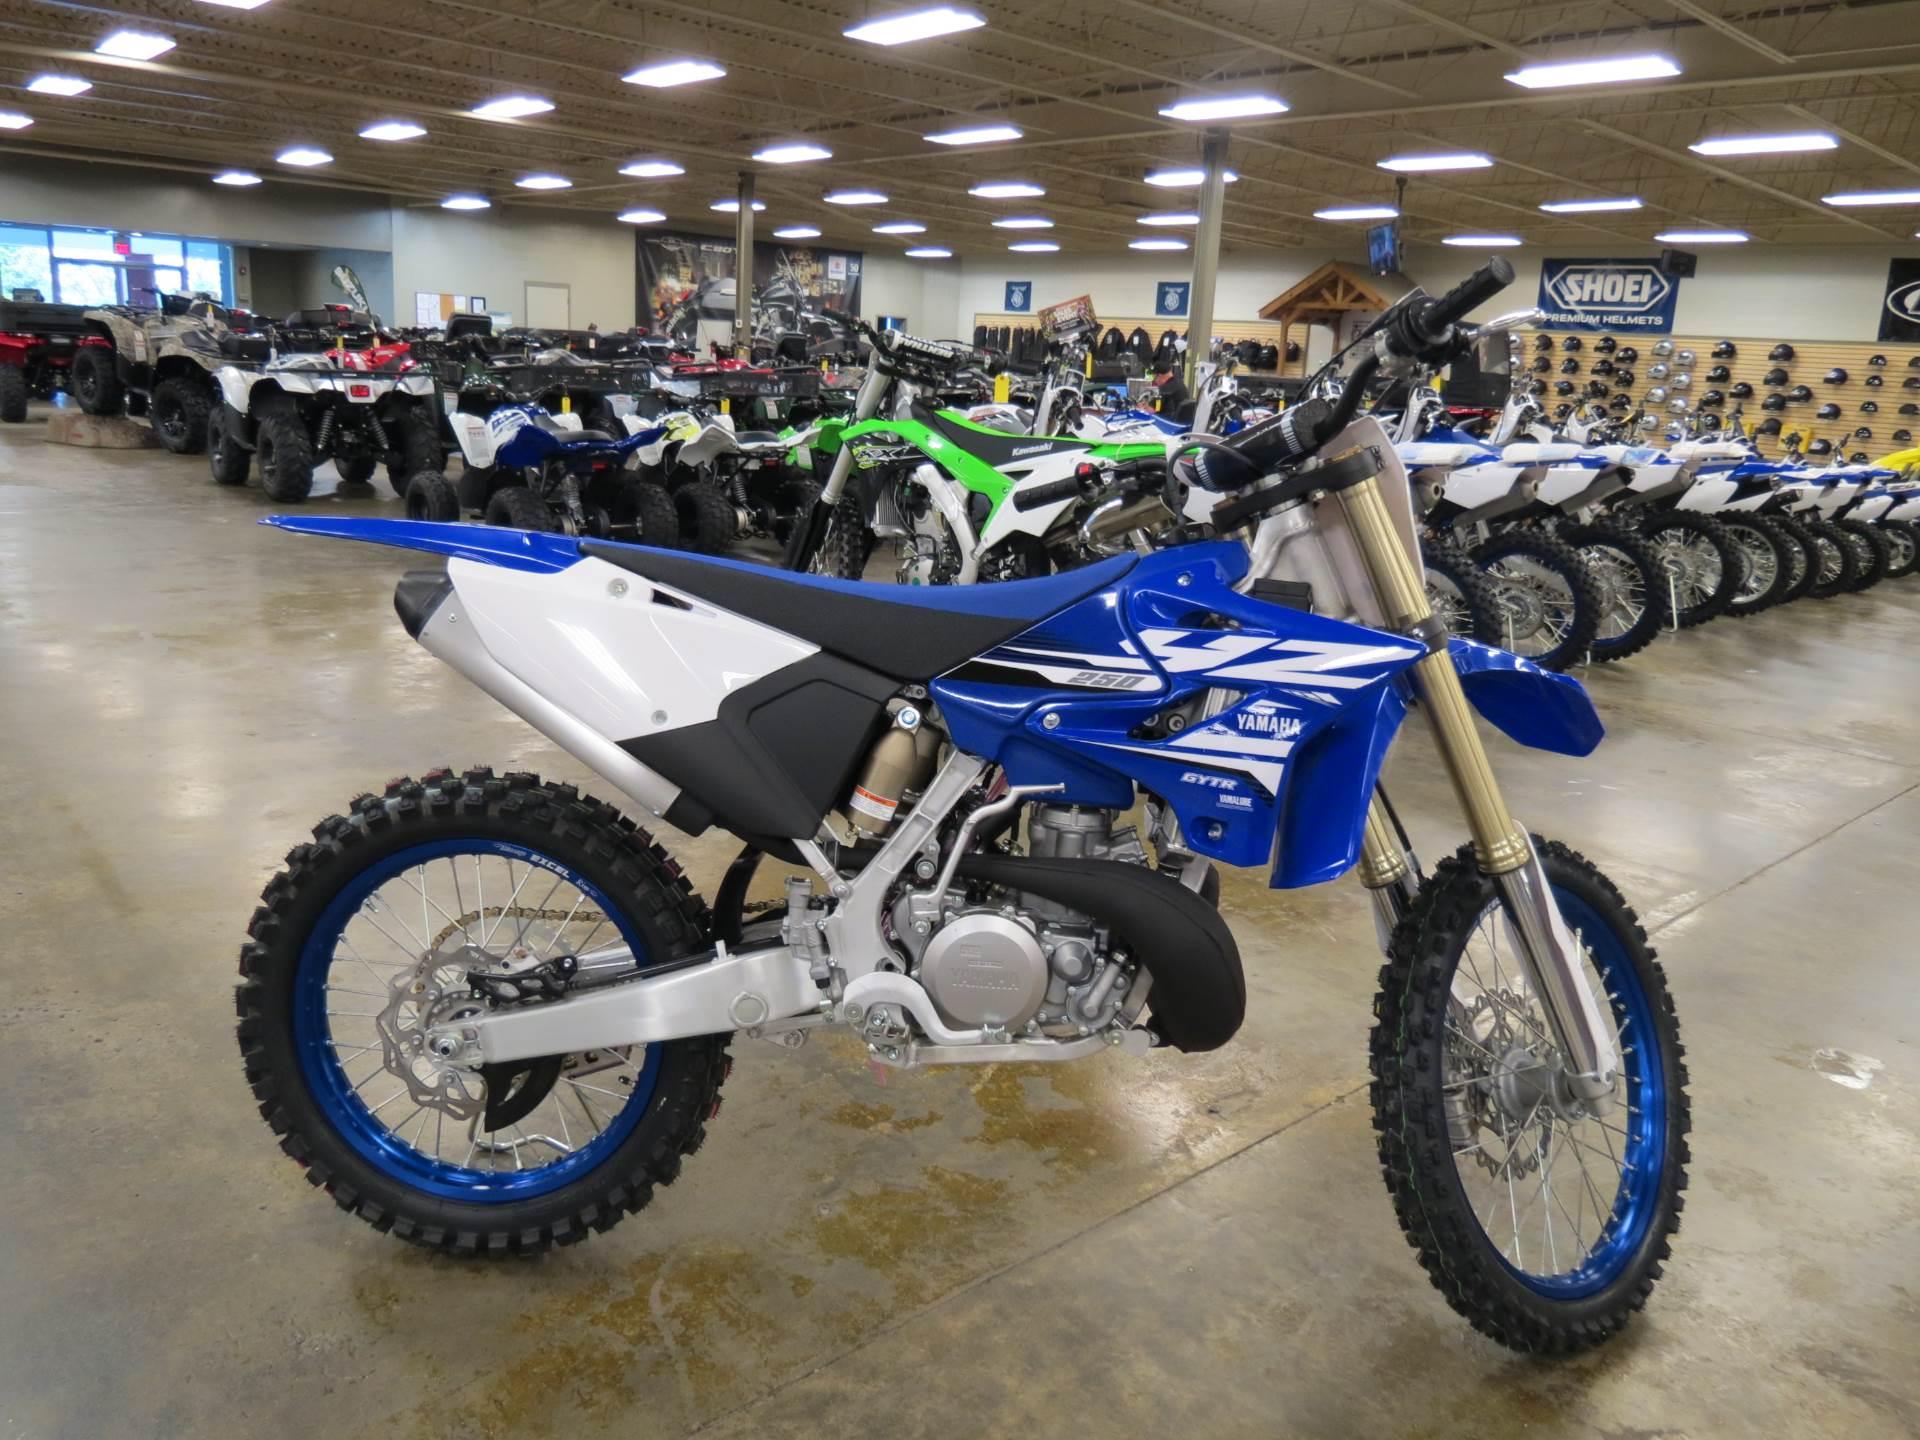 2018 Yamaha YZ250 Motorcycles Romney West Virginia 35125